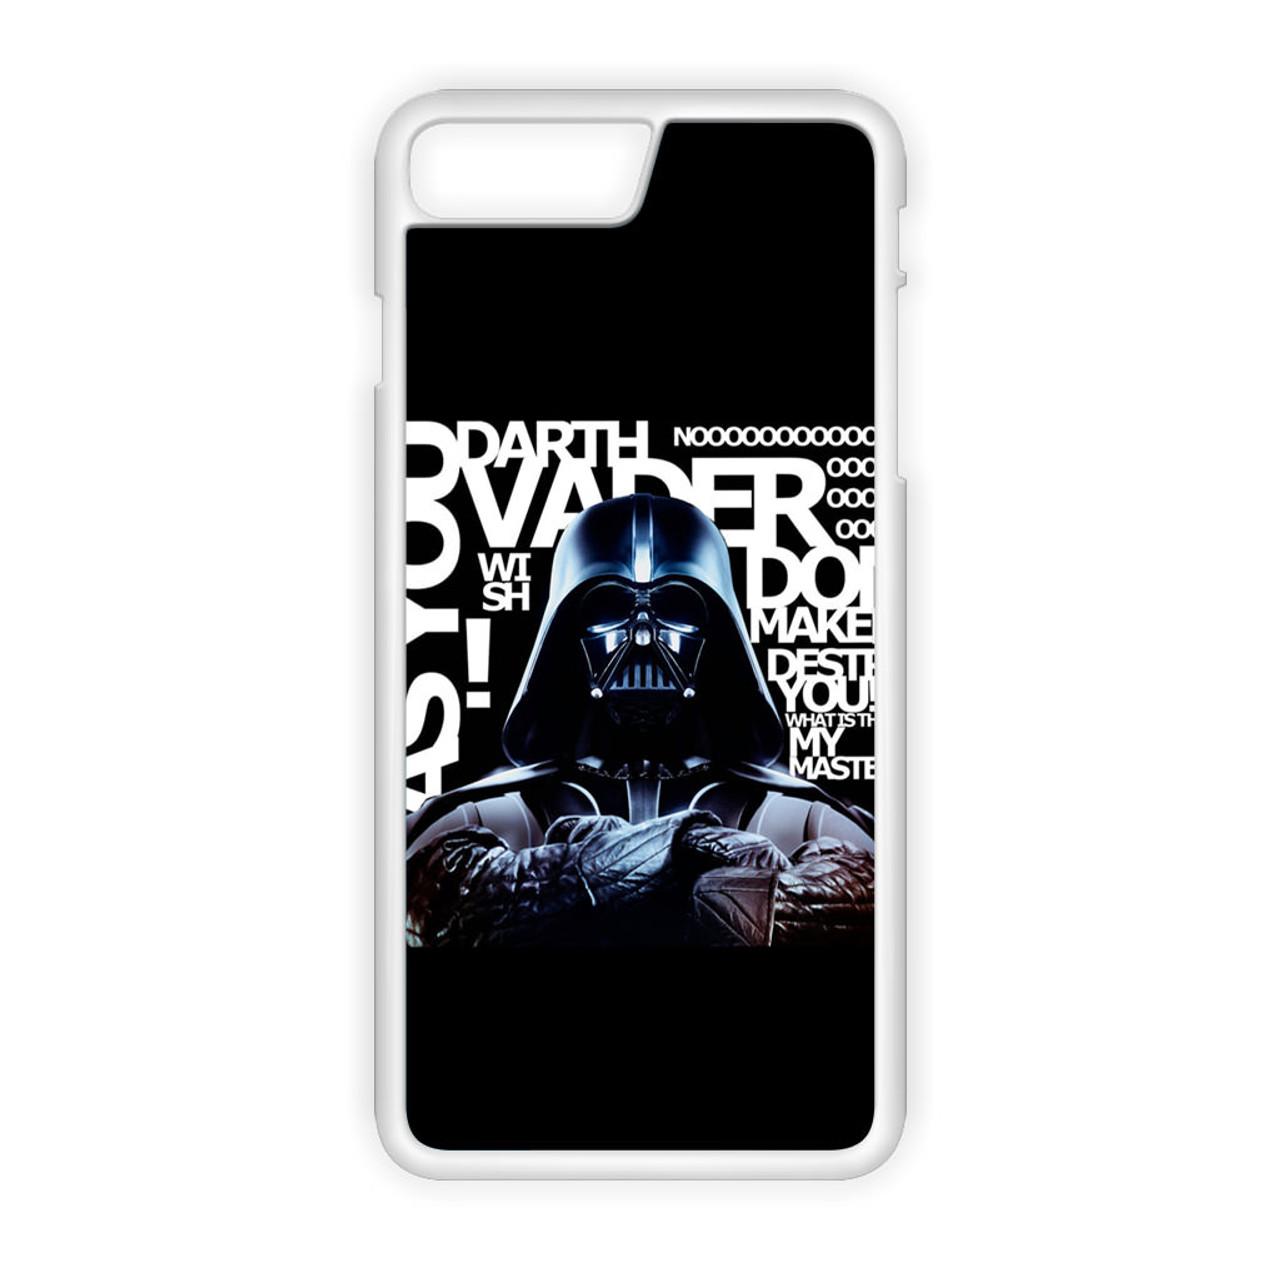 Star Wars Darth Vader Quotes Iphone 7 Plus Case